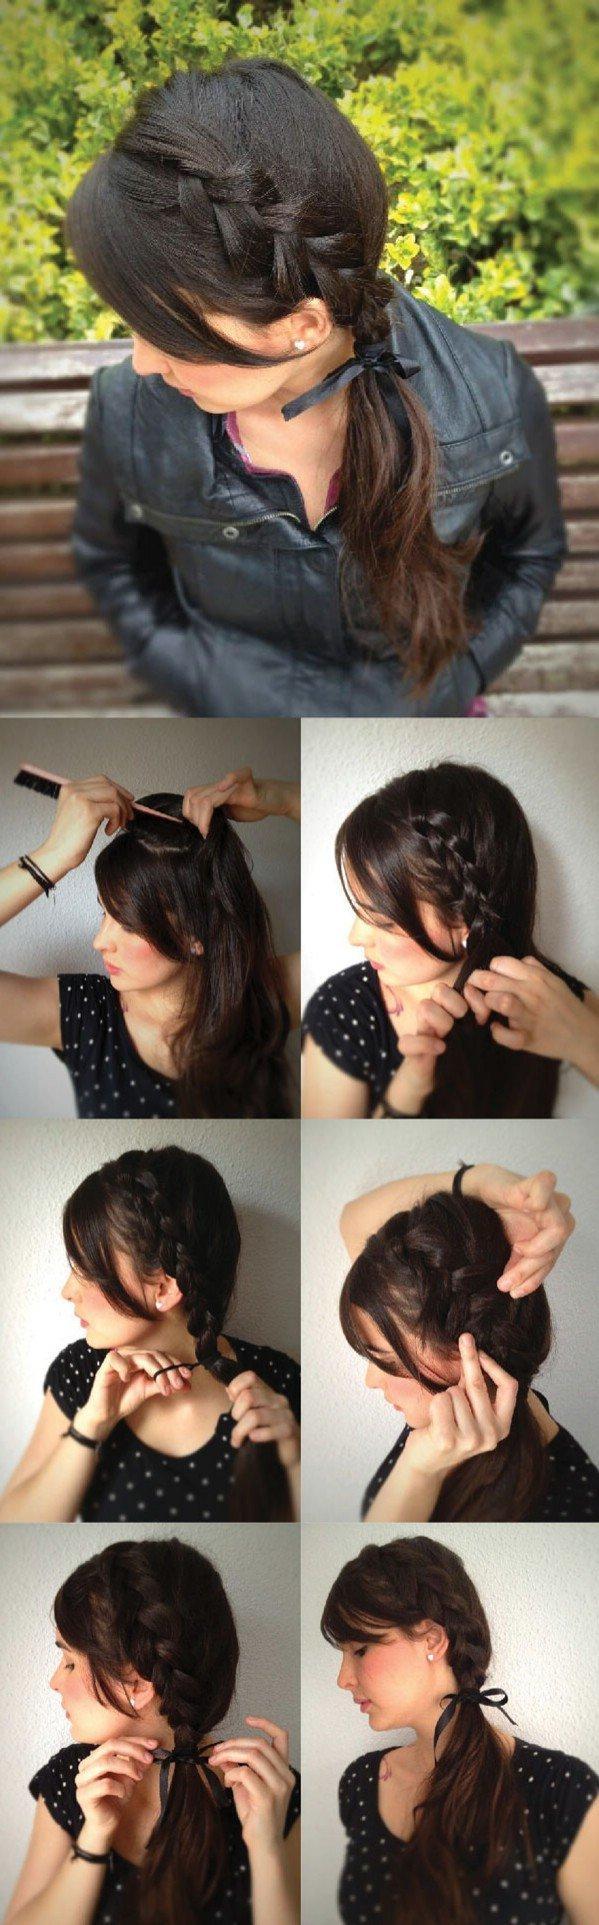 inverted-side-braid